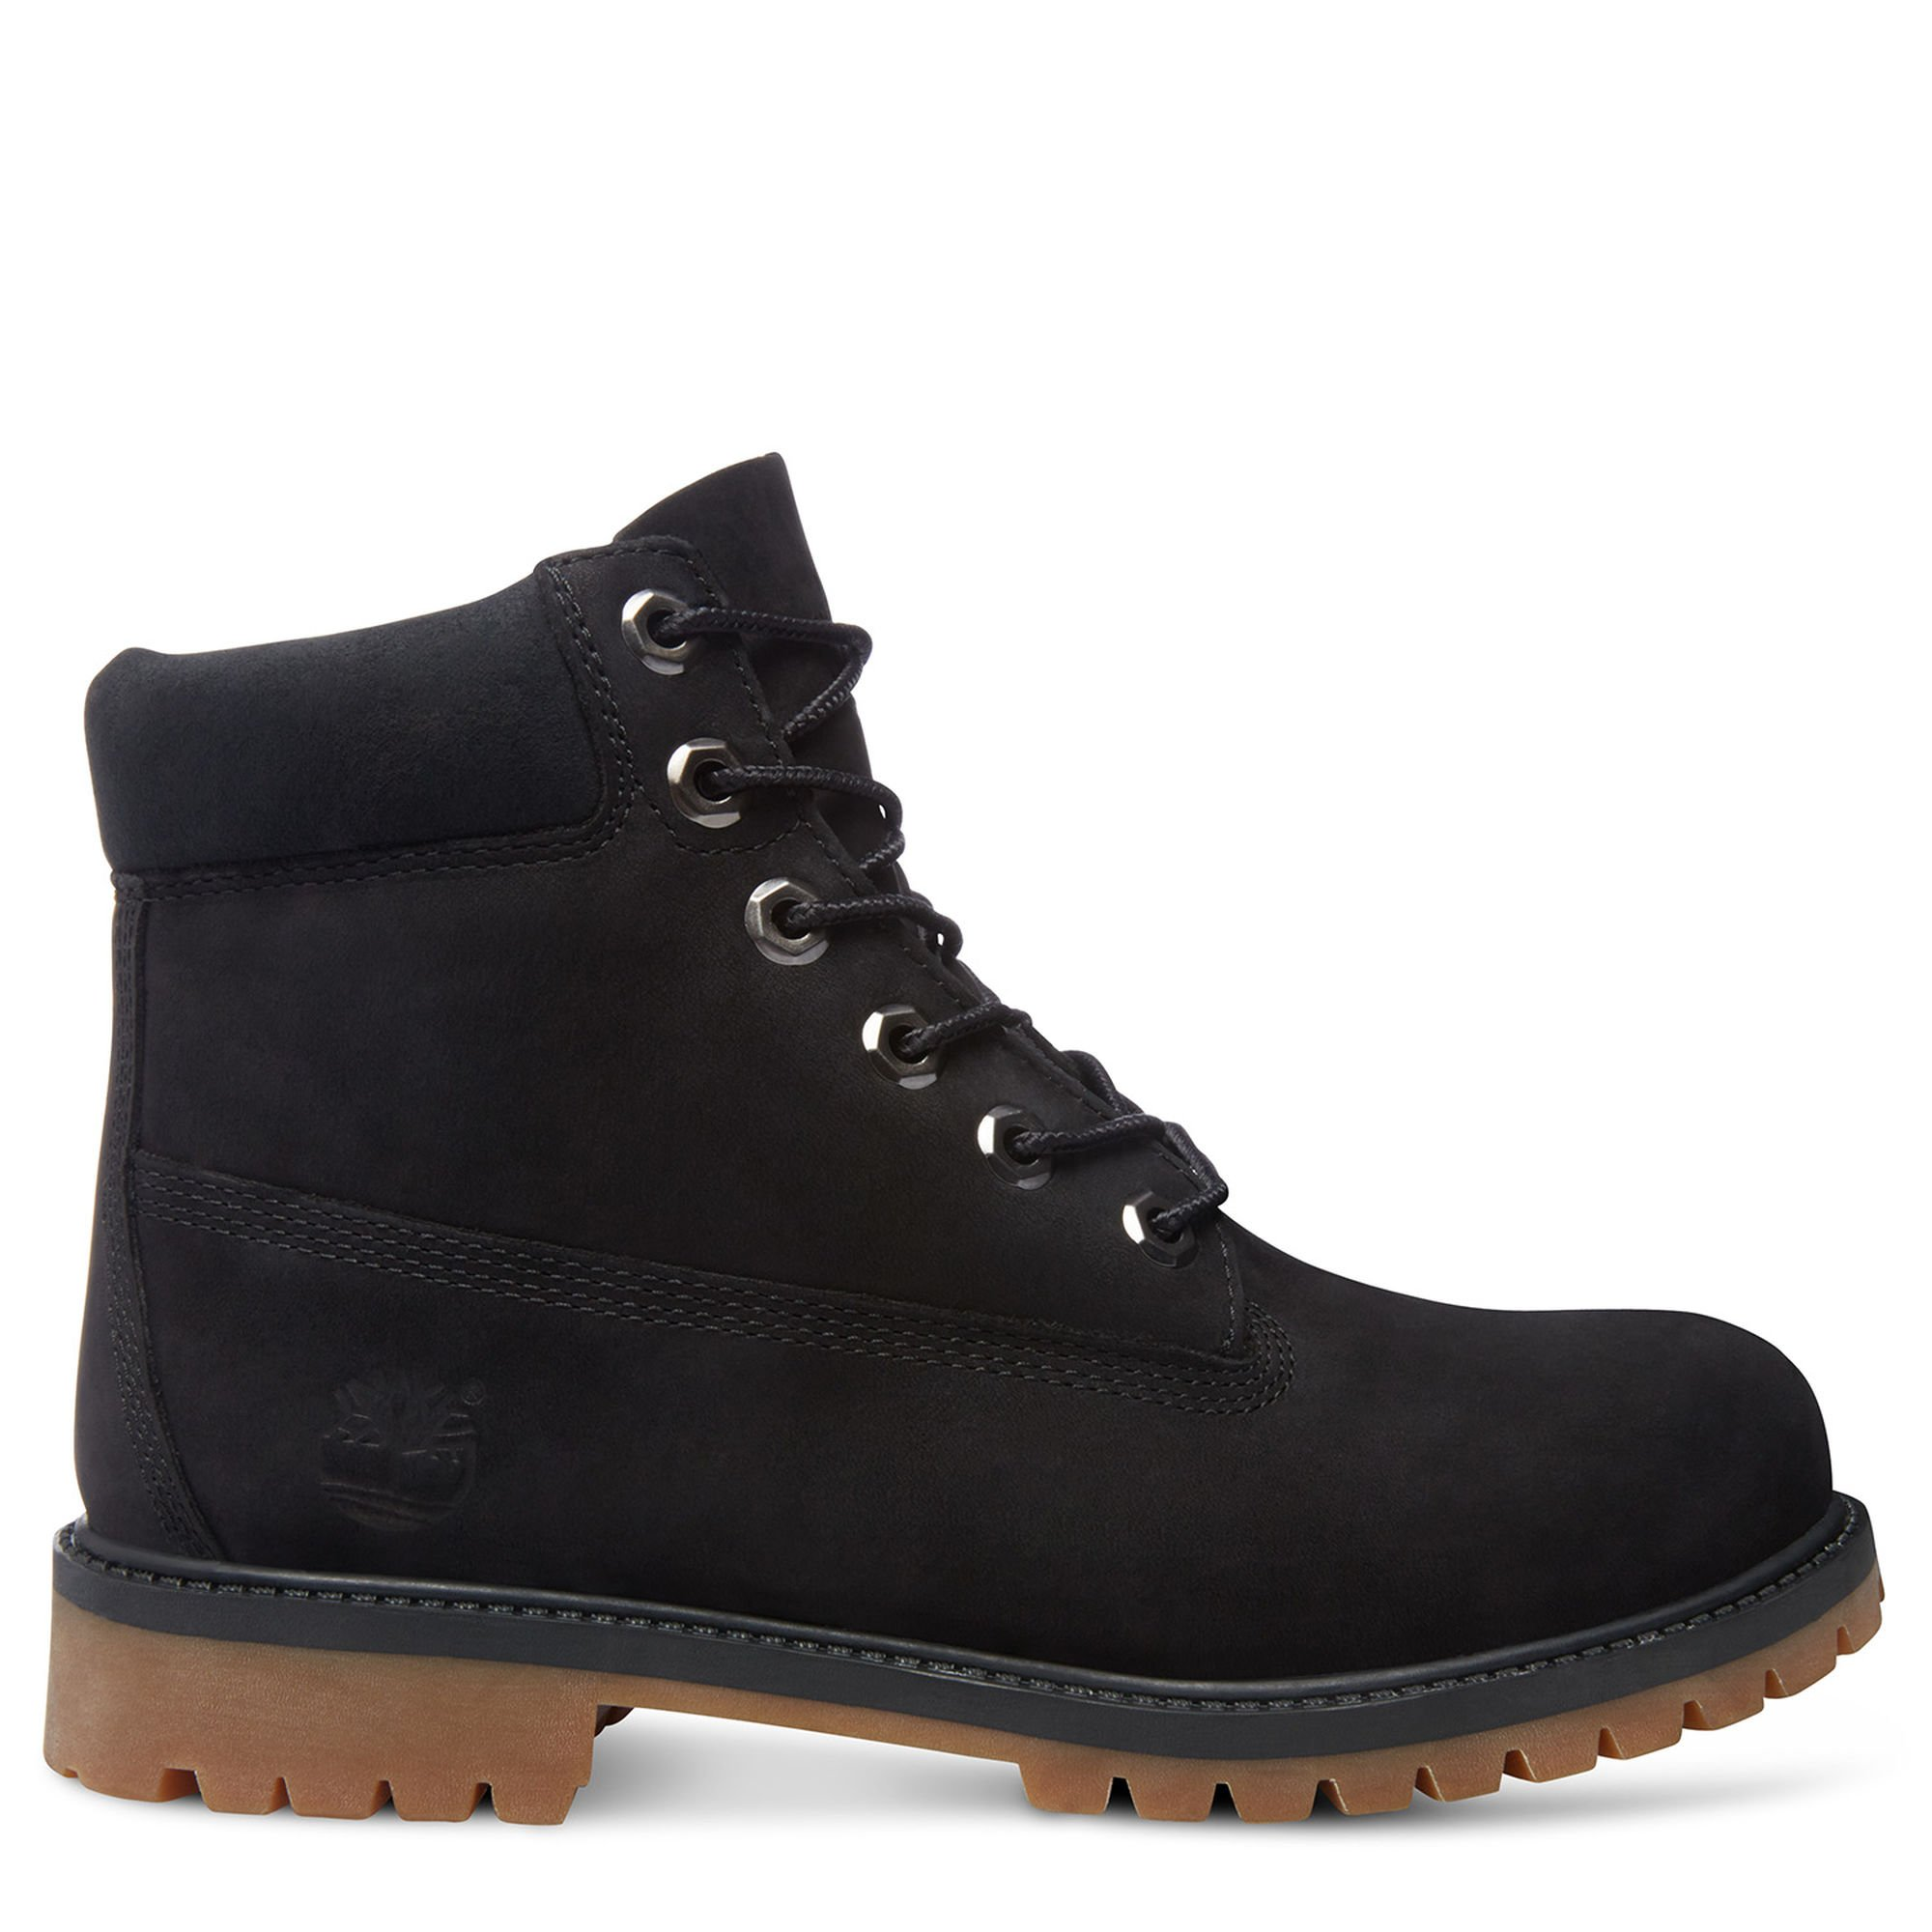 Timberland 6'' Premium Boot Youth US 4 Black Boot